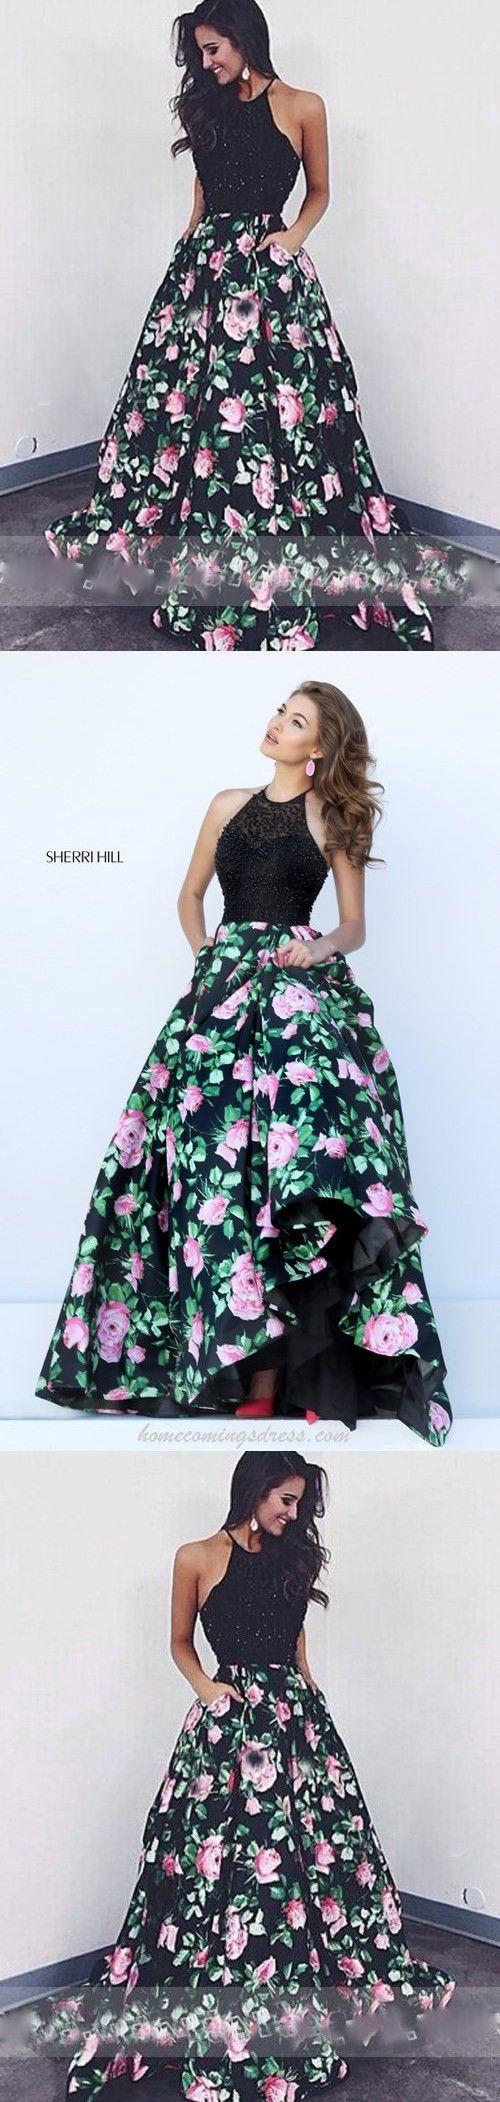 Black Ball Gown Beaded with Rose Print,Black A-line Evening Dress,Floor-length Formal Dress With Beading,Prom Dresses,M000147#prom #promdress #promdresses #longpromdress #promgowns #promgown #2018style #newfashion #newstyles #2018newprom#eveninggowns#black#ballgown#beaded#roseprint